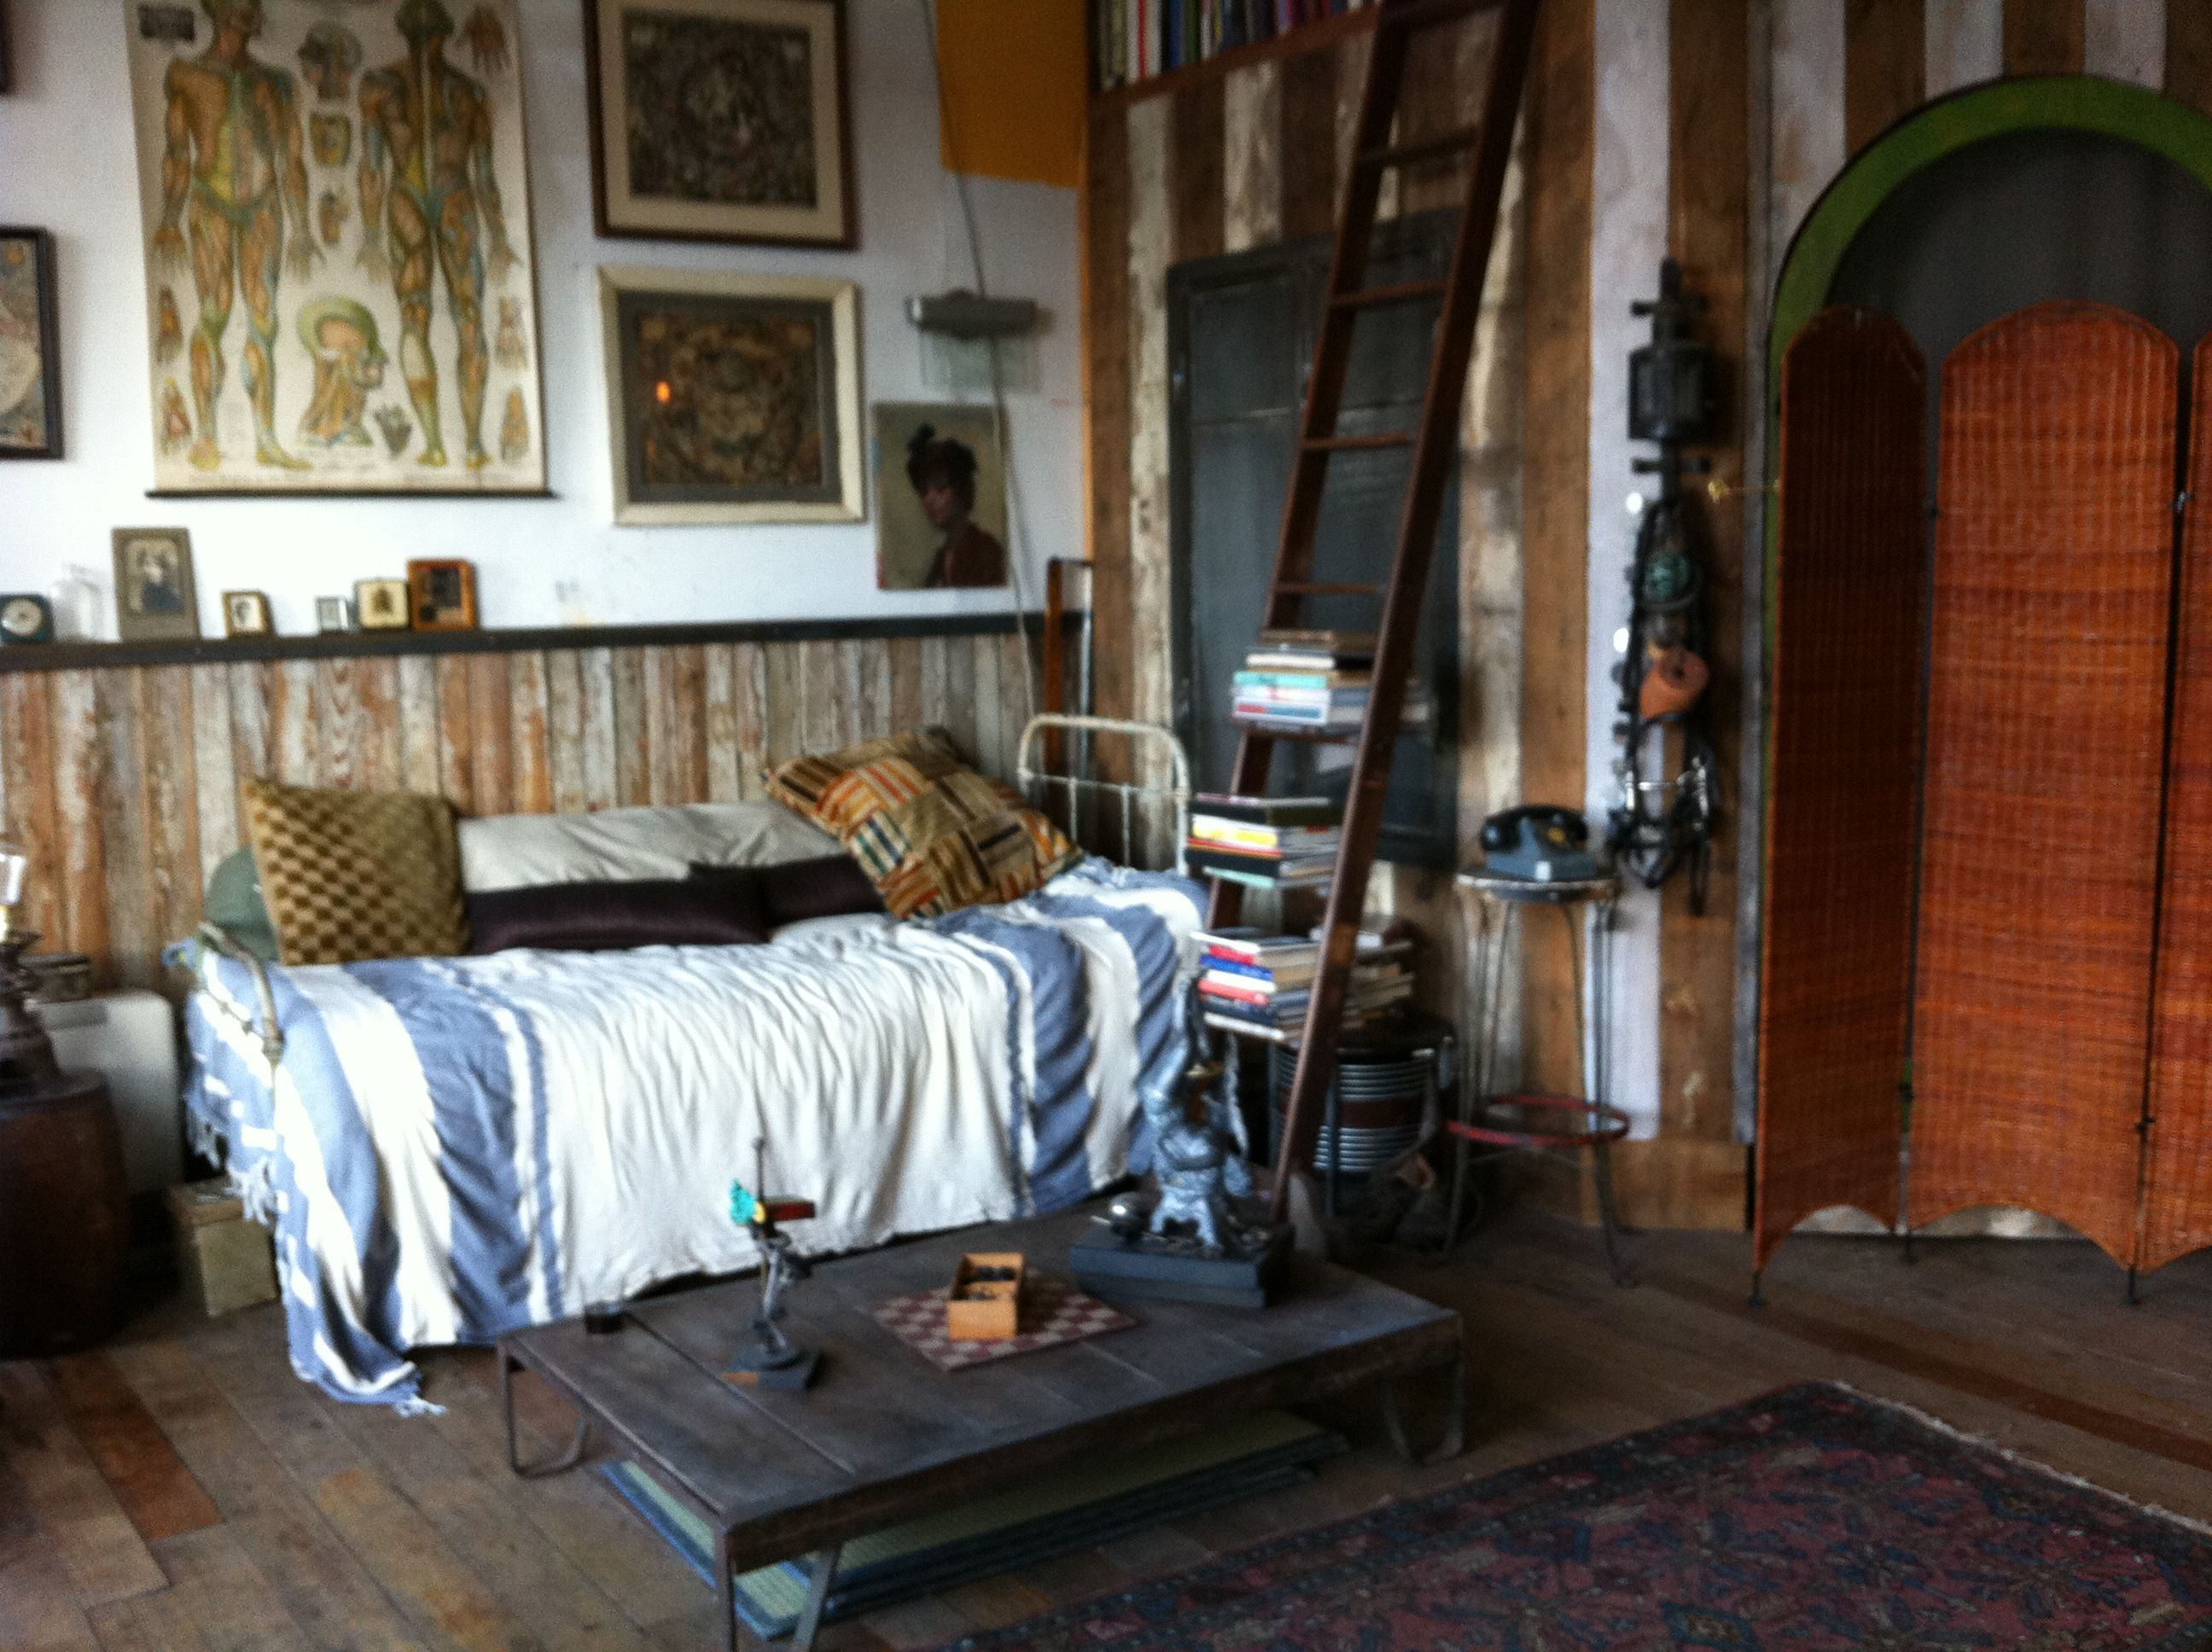 Artist loft in Dumbo, Brooklyn - full of antiques | Interesting ...